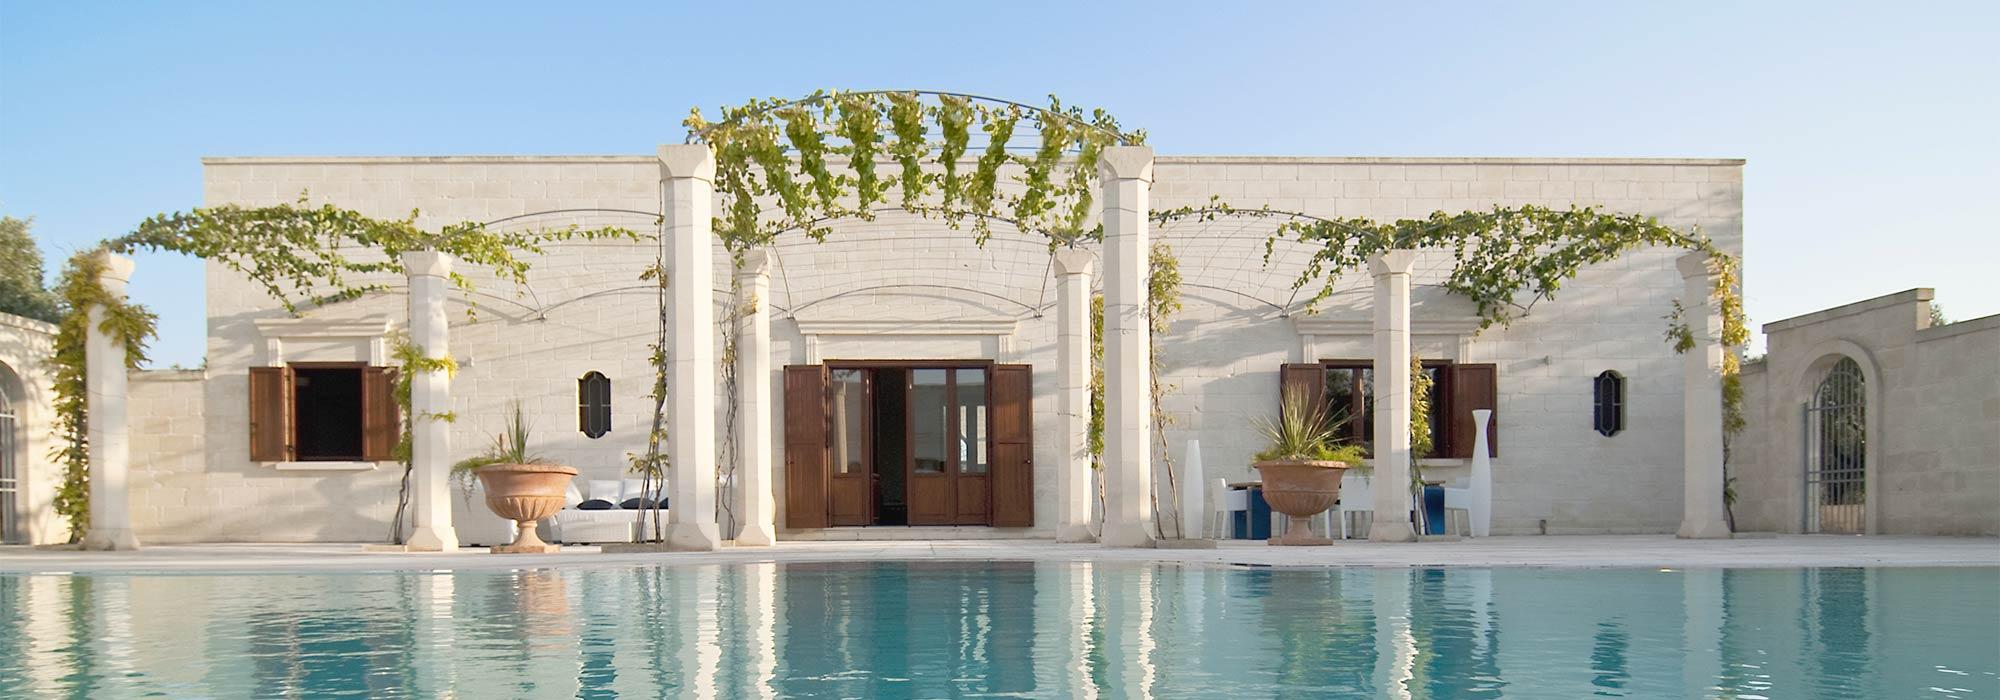 Masseria la Palma – Luxury Villa in Puglia – Sleeps 10